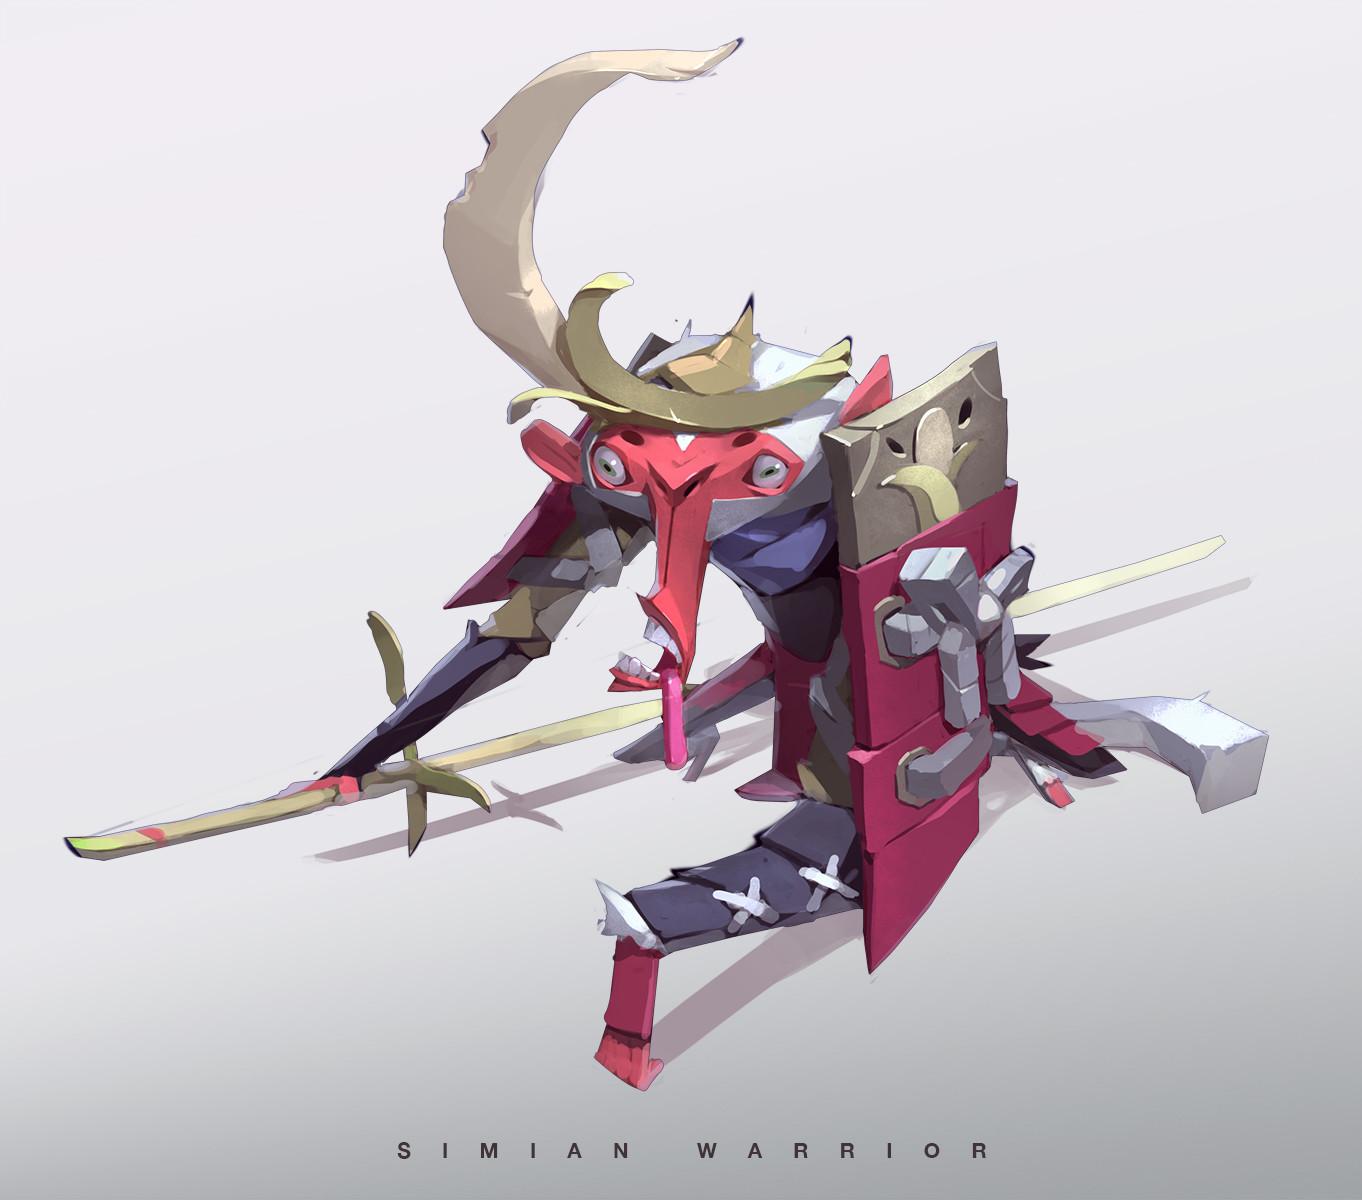 Simian Warrior